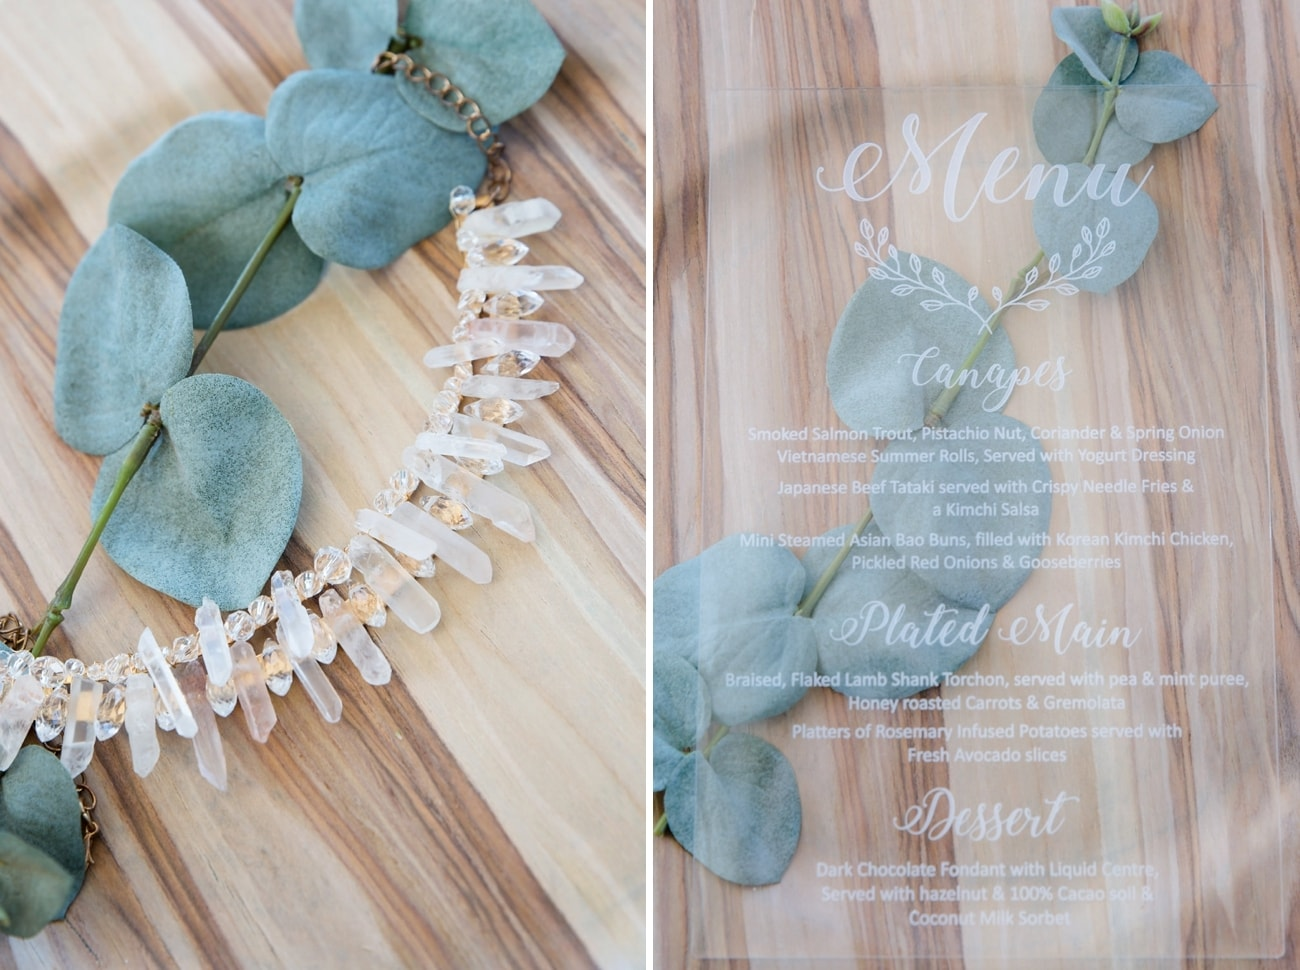 Crystal Bridal Necklace & Perspex Menu   Image: Jaqui Franco